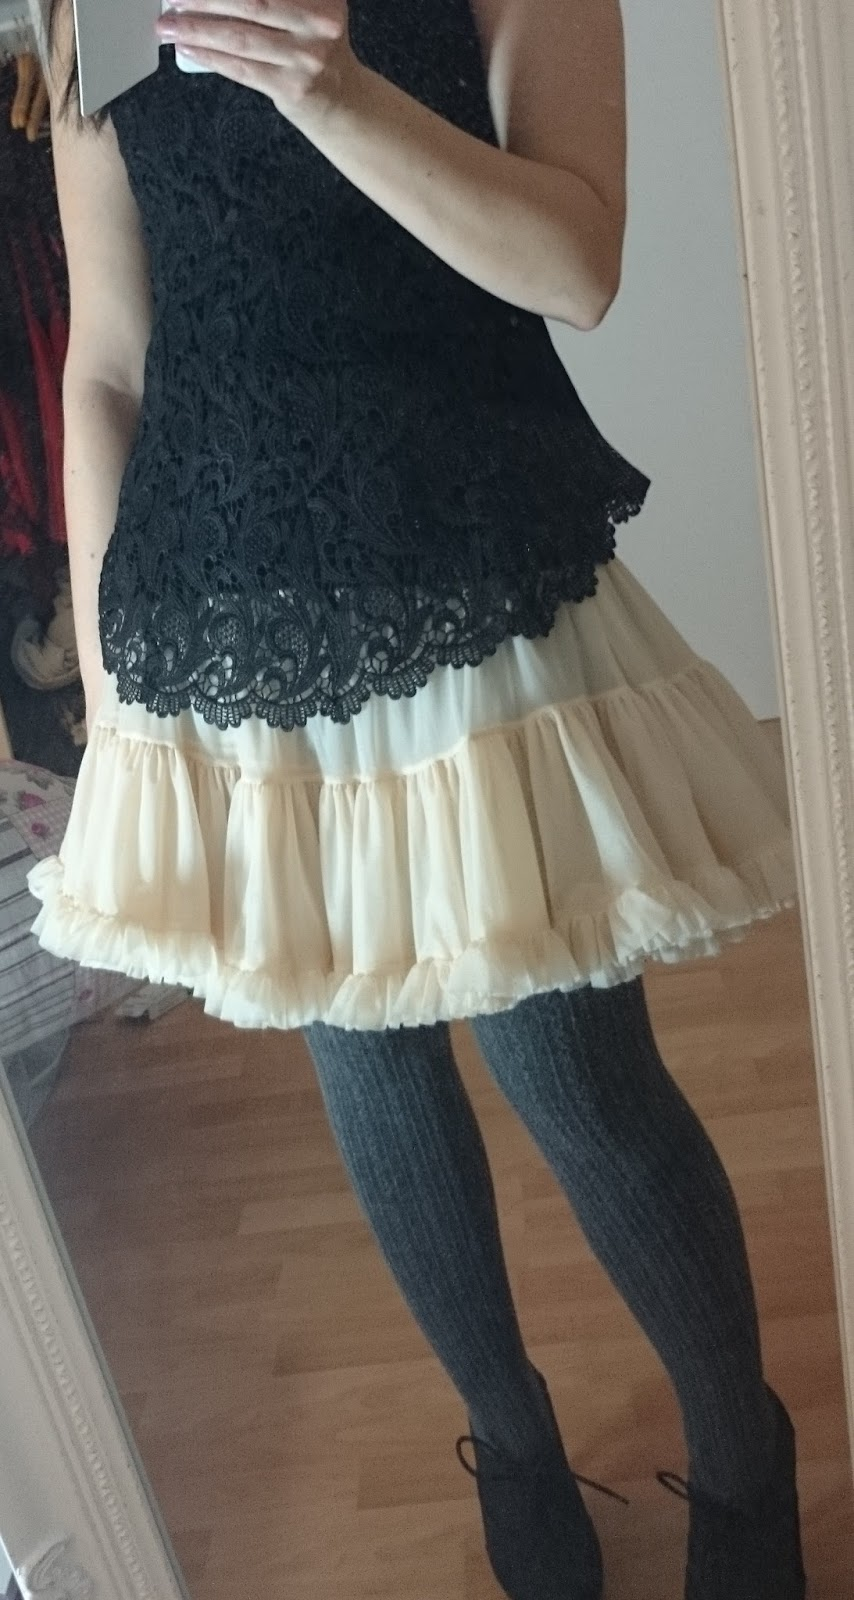 Petticoat und Strickstrumpfhose